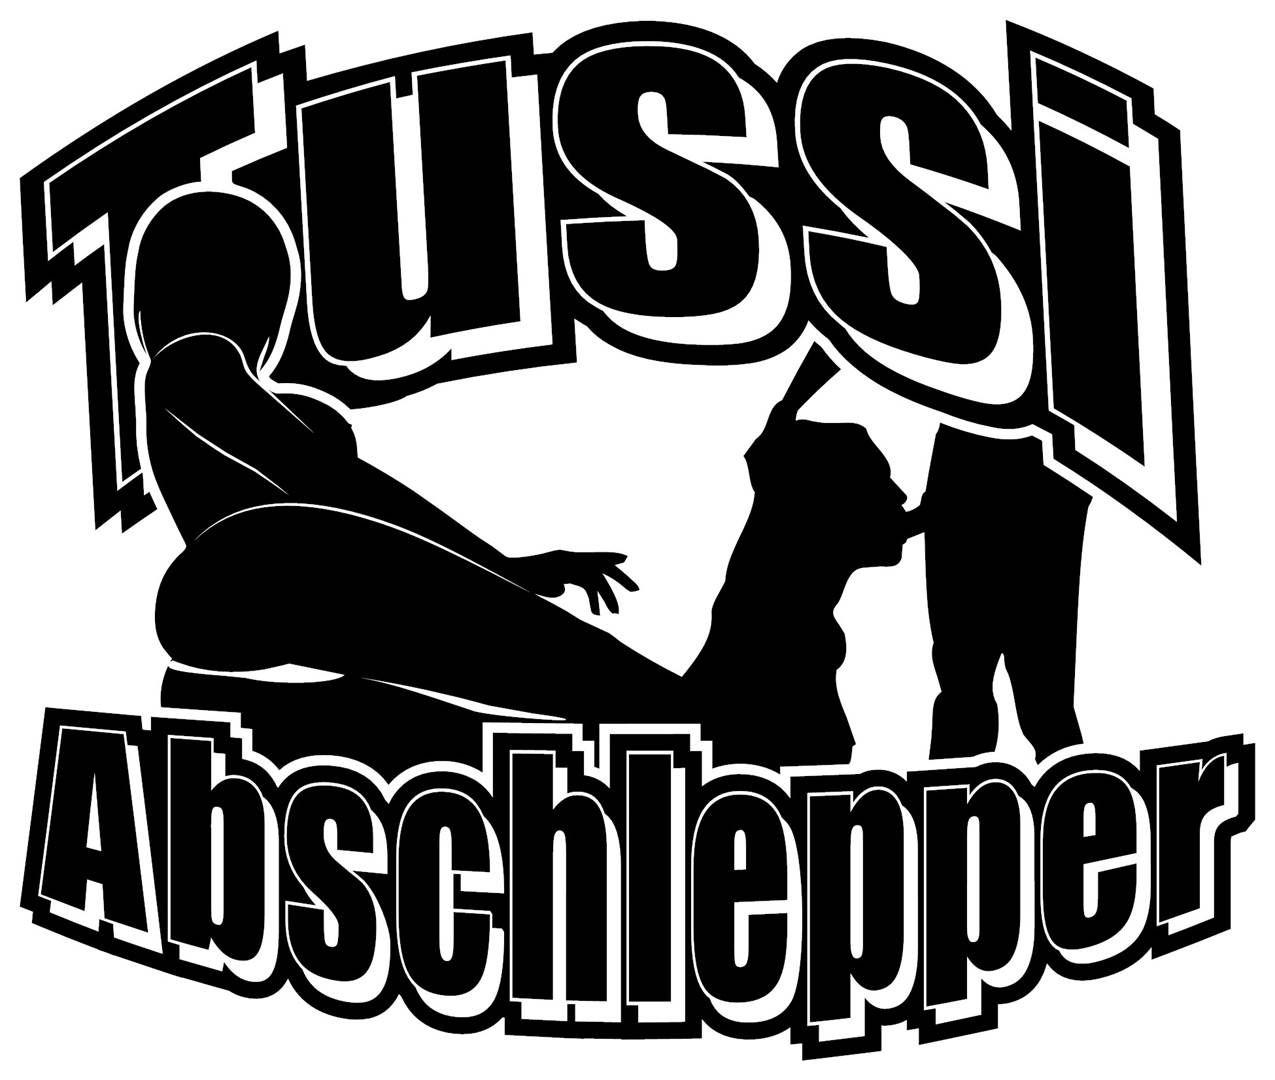 Tussi Abschlepper